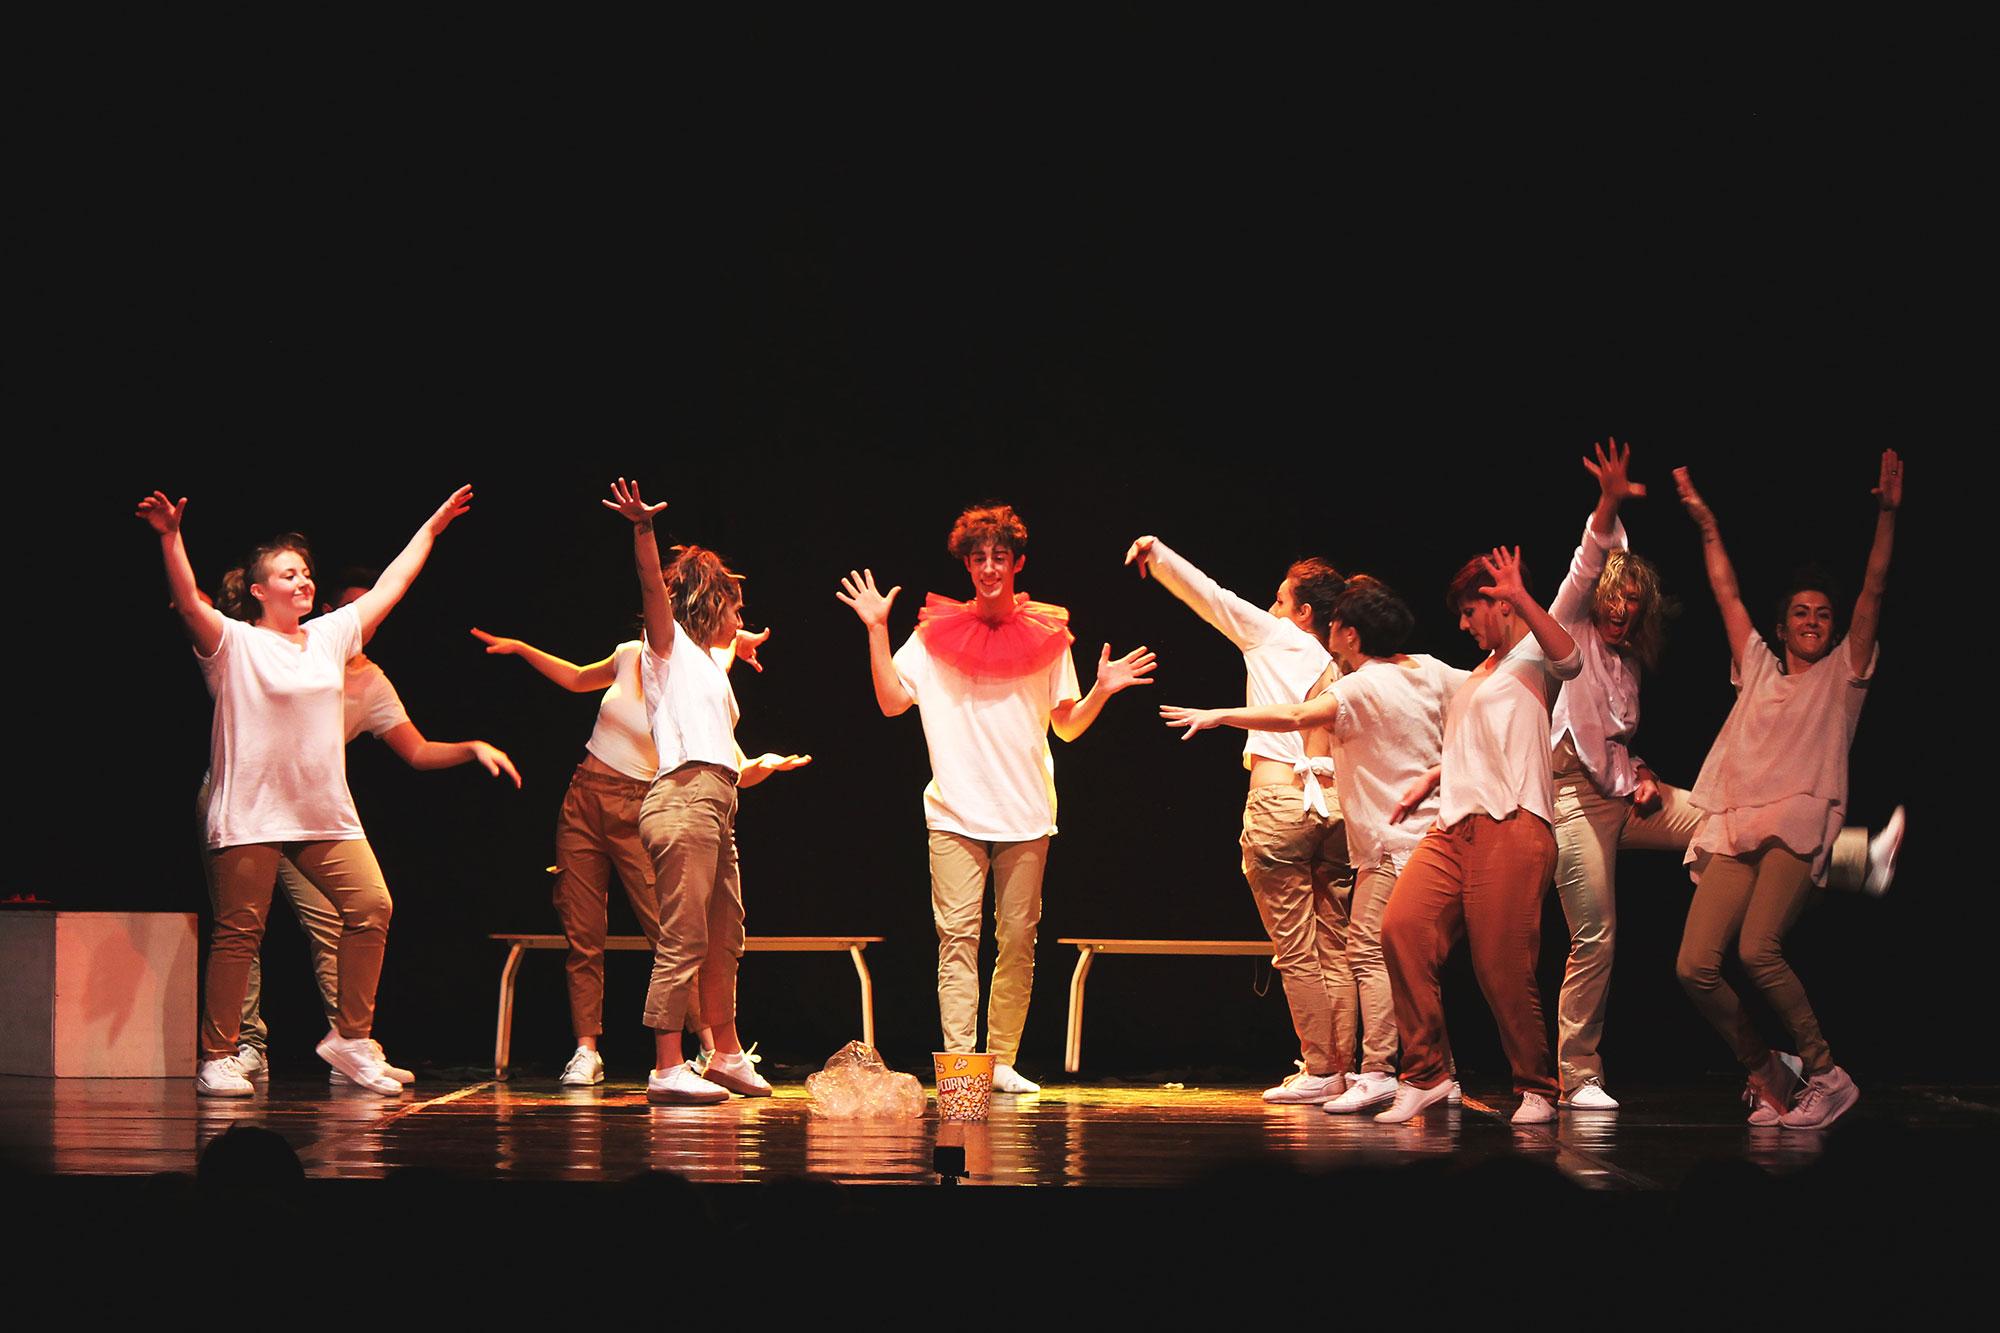 Round Trip | Teatro Binario 7 - Monza_24